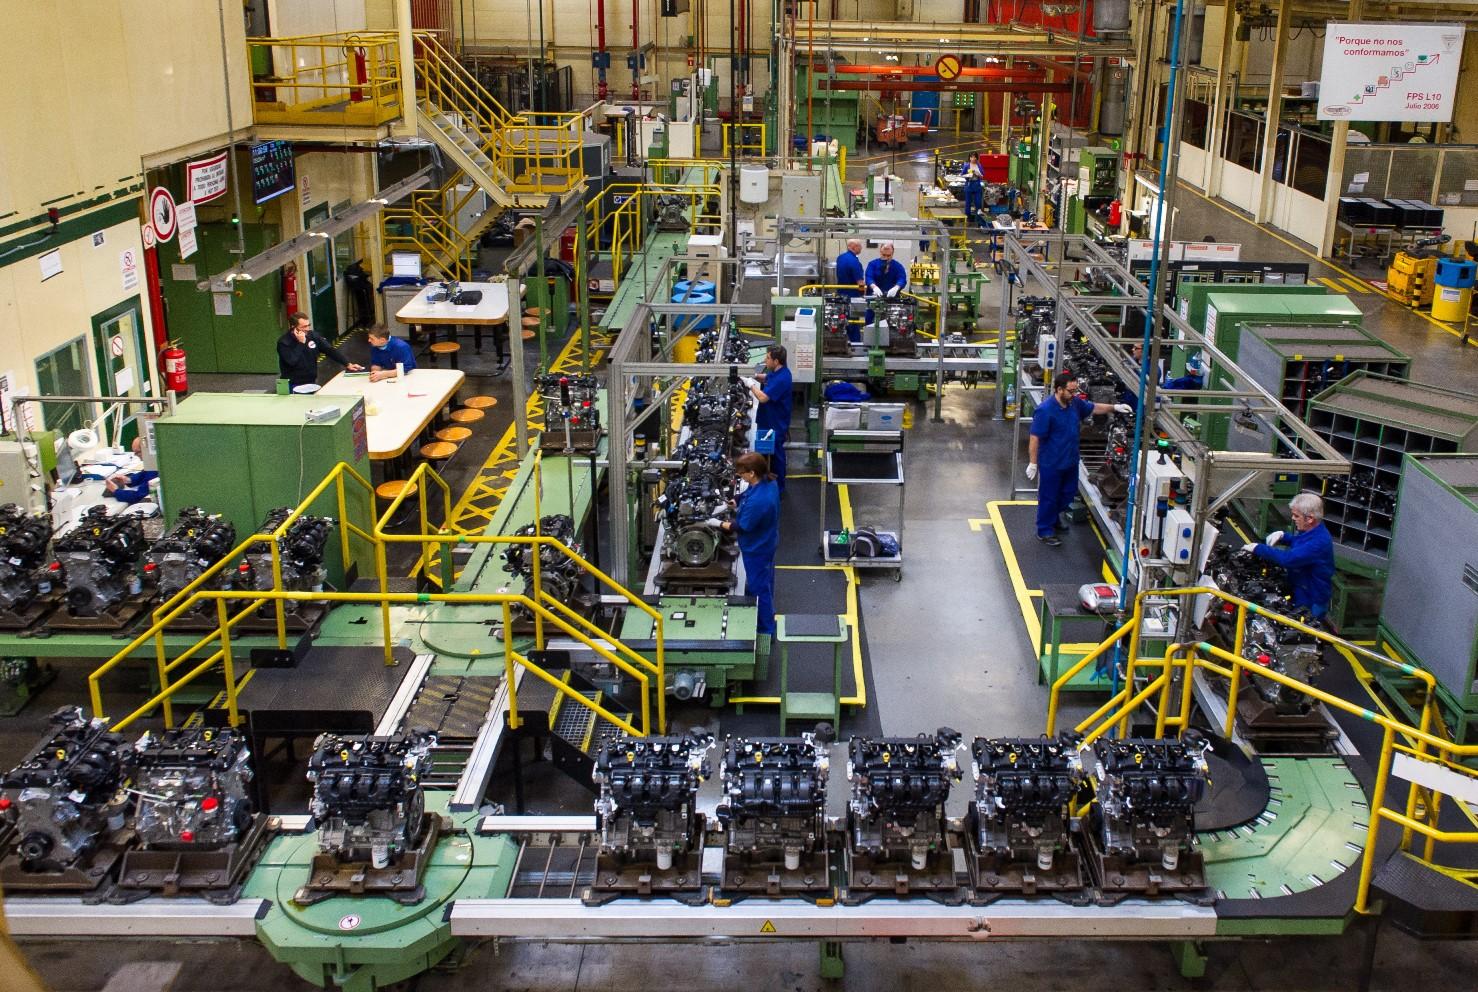 Ford Fabrica Su Motor Ecoboost Número Cinco Millones, Casi Un T